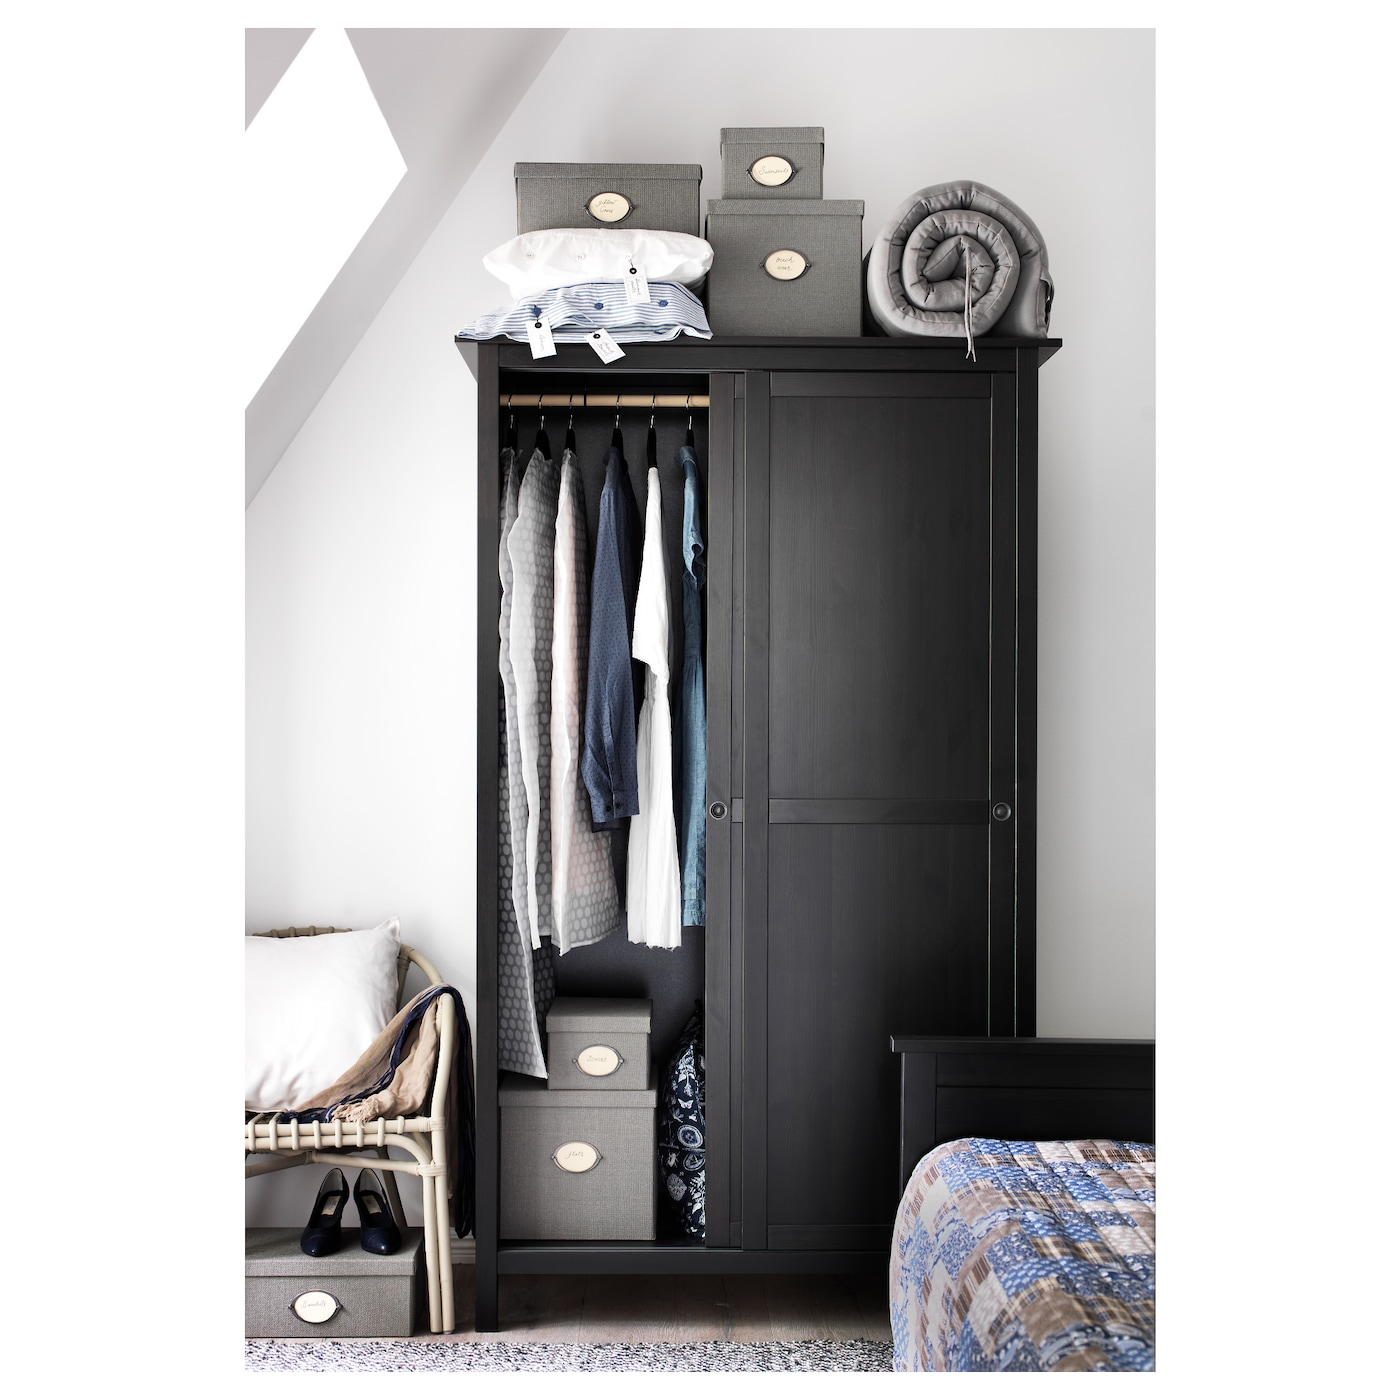 Hemnes Wardrobe With 2 Sliding Doors Black Brown 47 1 4x77 1 2